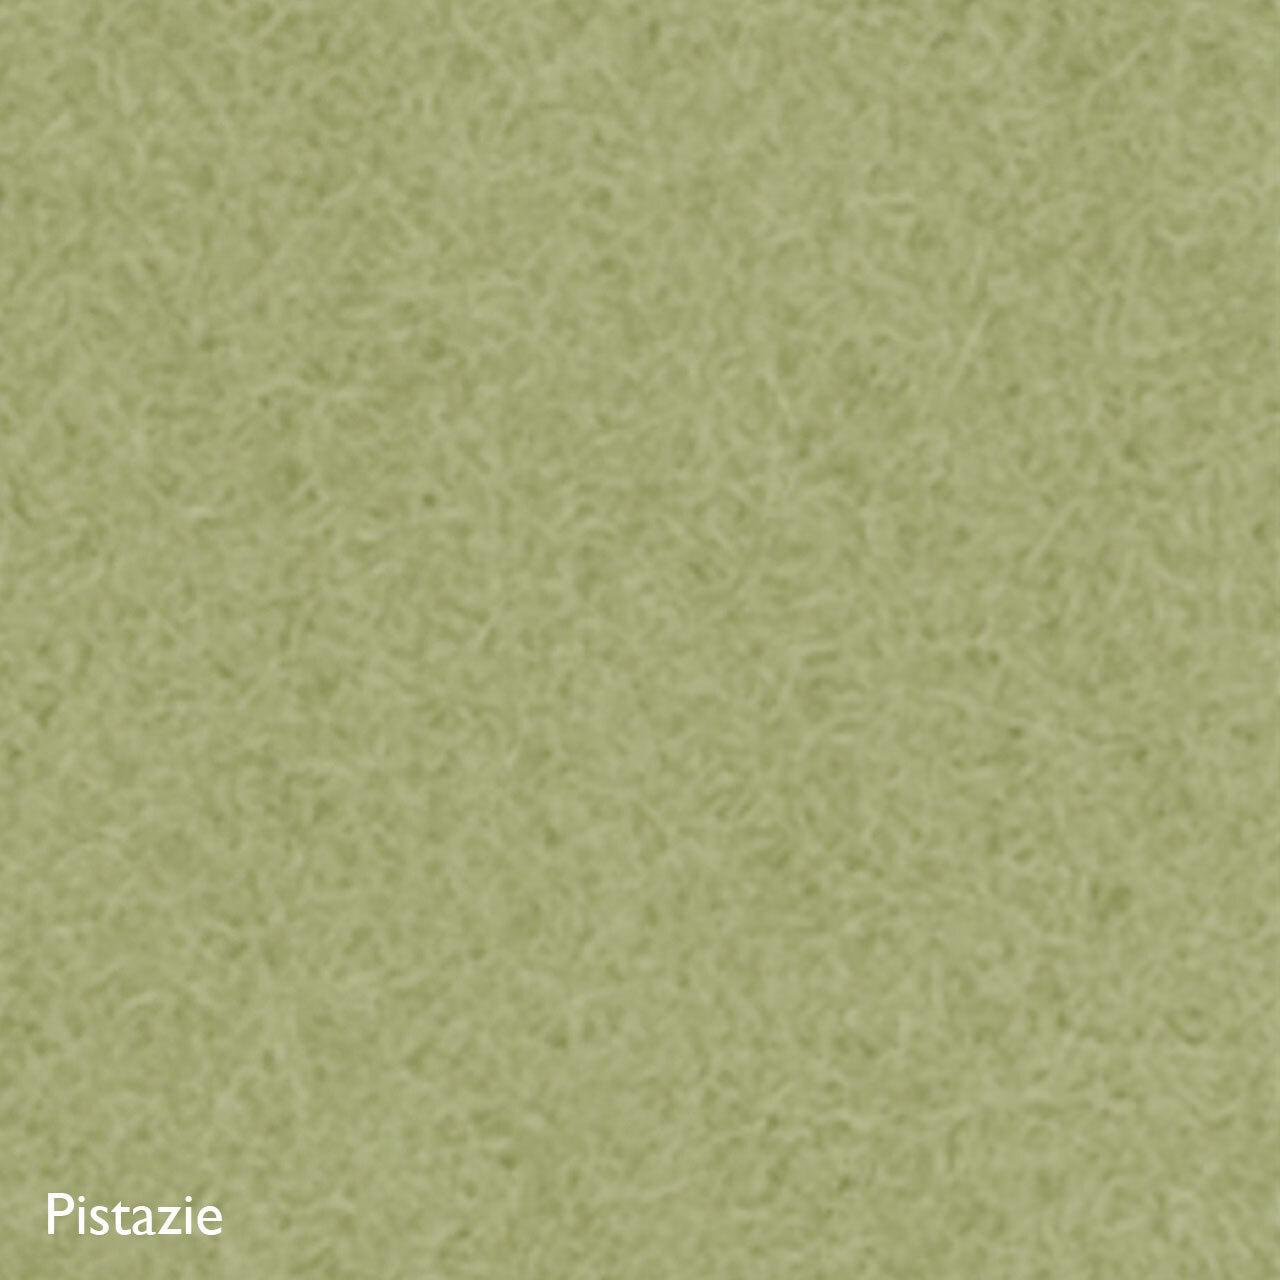 Hey-Sign Sitzmöbel 'Big Quart'  Pistazie,  80 x 80 x 40 cm